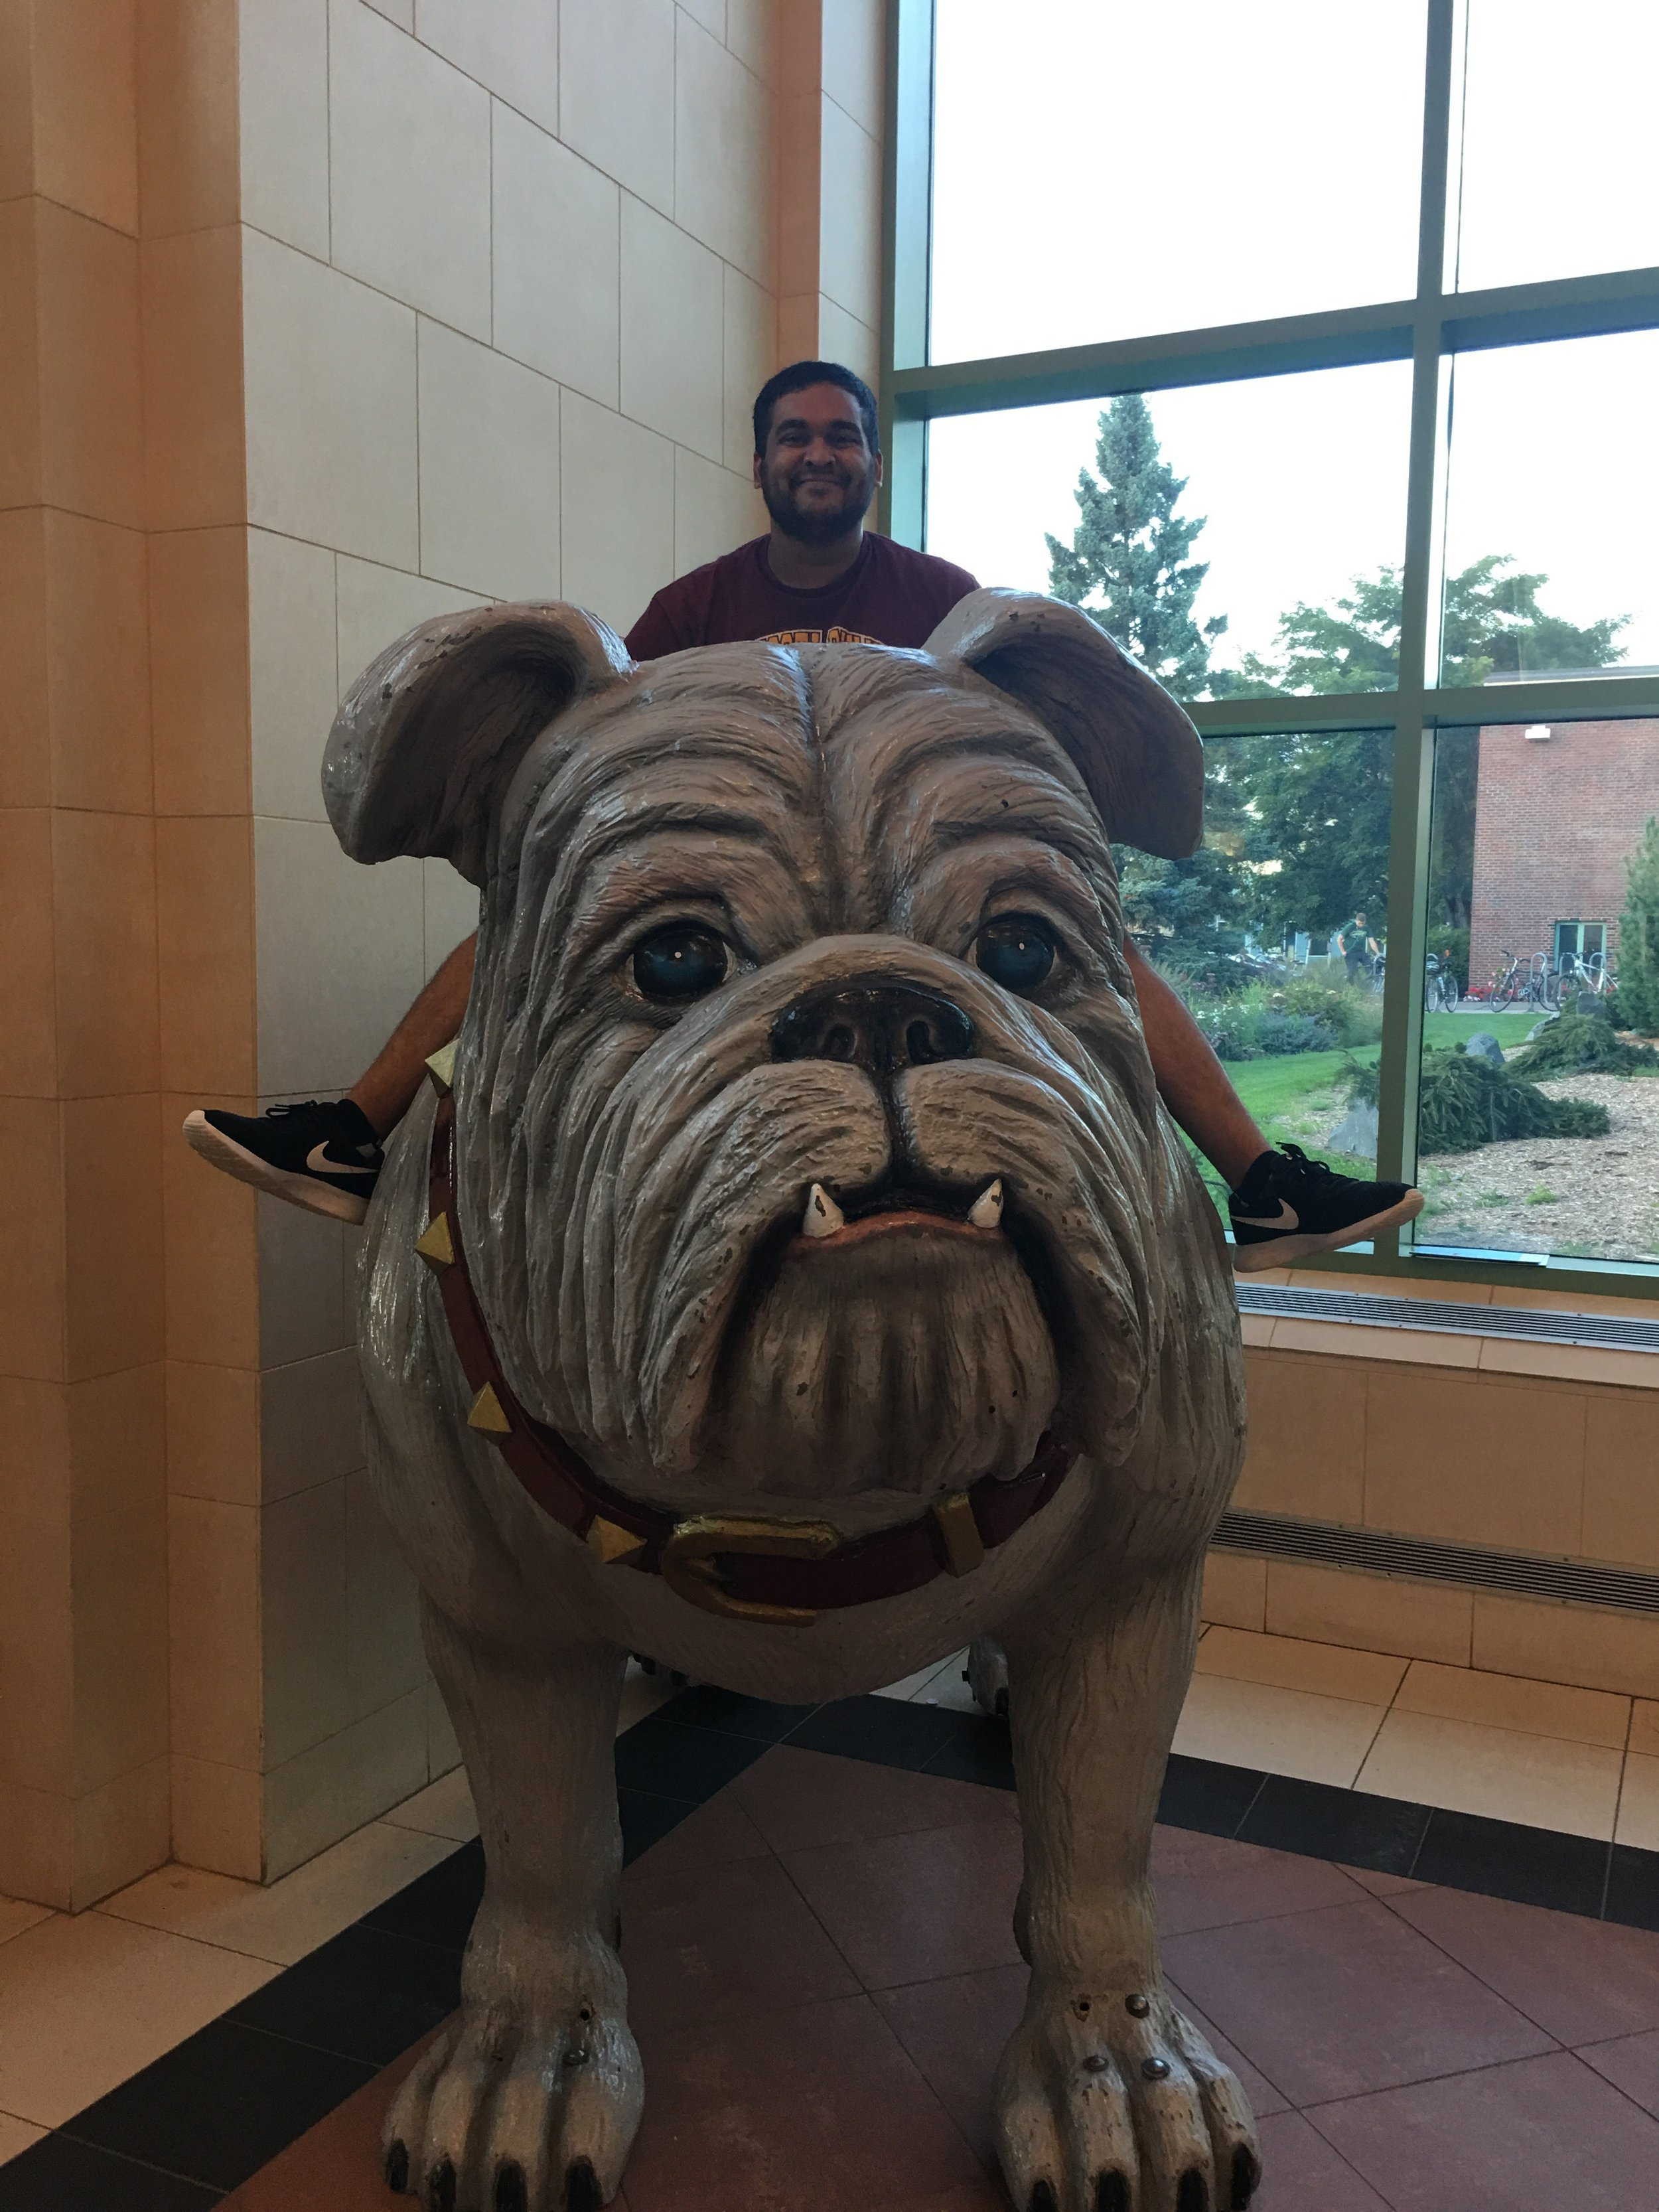 Bhakta showing his bulldog spirit - Credit: Isaac Wolf